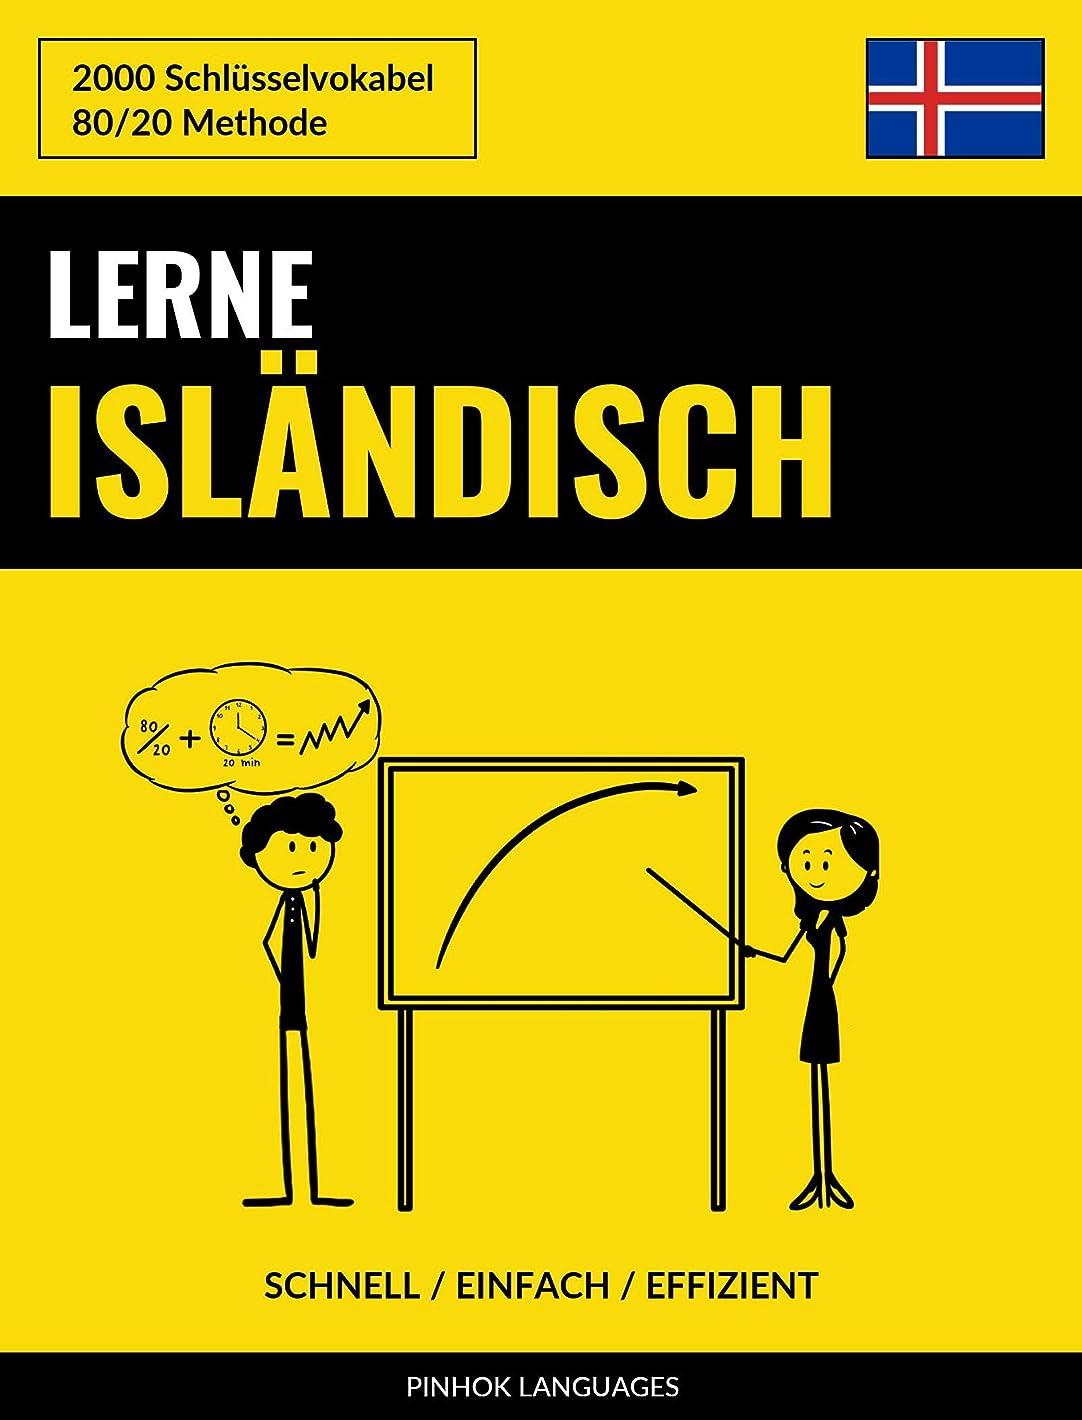 間接的不格好ジュニアLerne Isl?ndisch - Schnell / Einfach / Effizient: 2000 Schlüsselvokabel (German Edition)